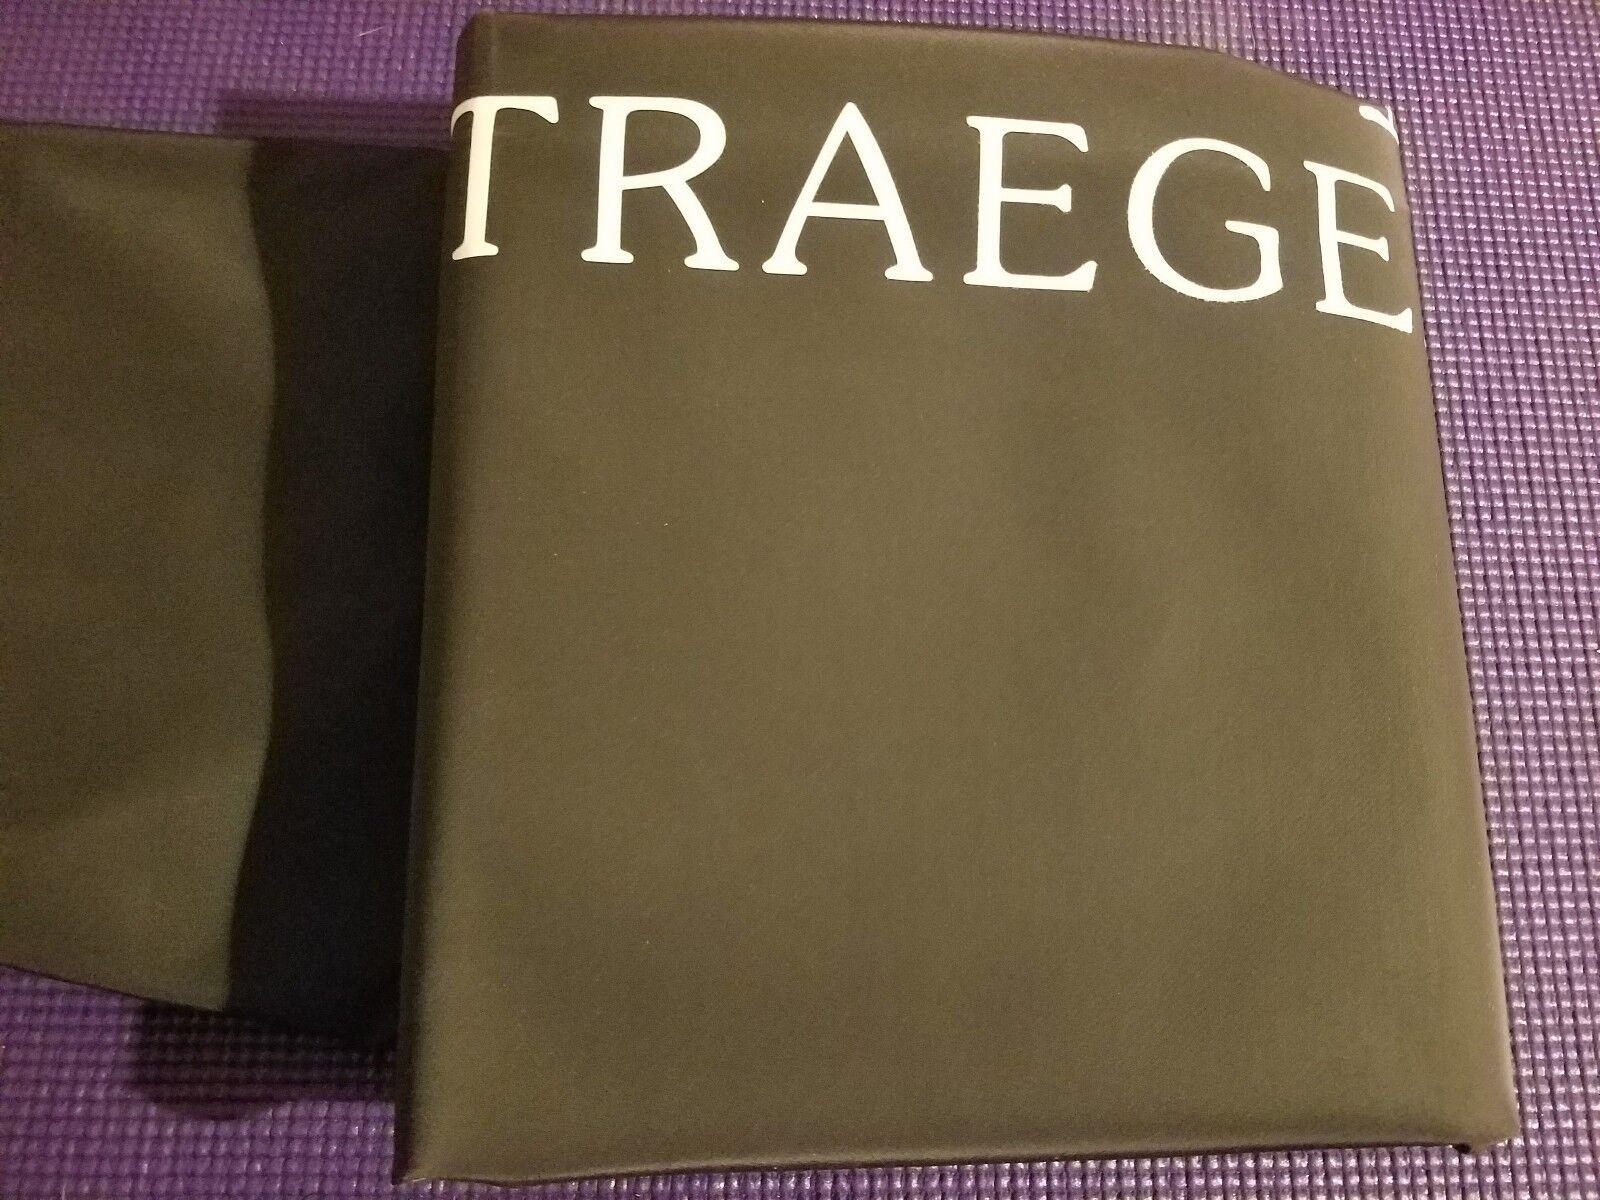 Traeger BAC374 20 serie Integral Parrilla Cubierta-Nuevo